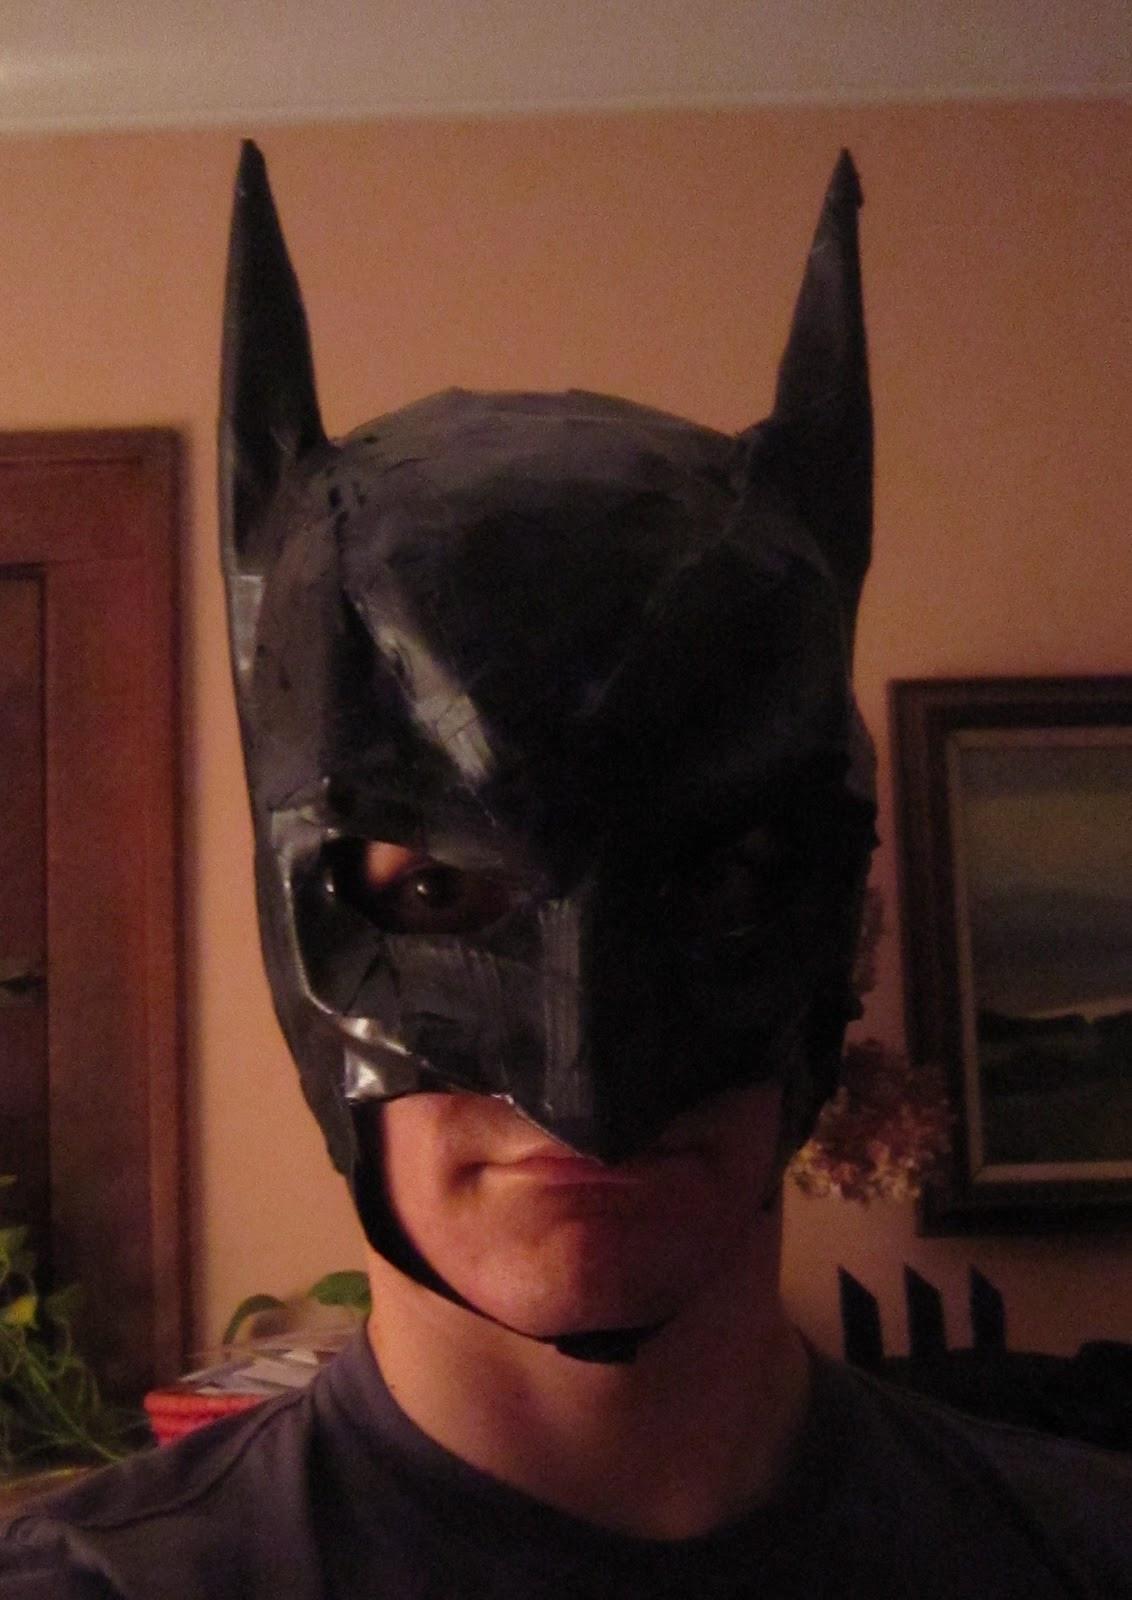 Best ideas about Batman Mask DIY . Save or Pin Chuck Does Art DIY Batman Costume Mask Part II Now.